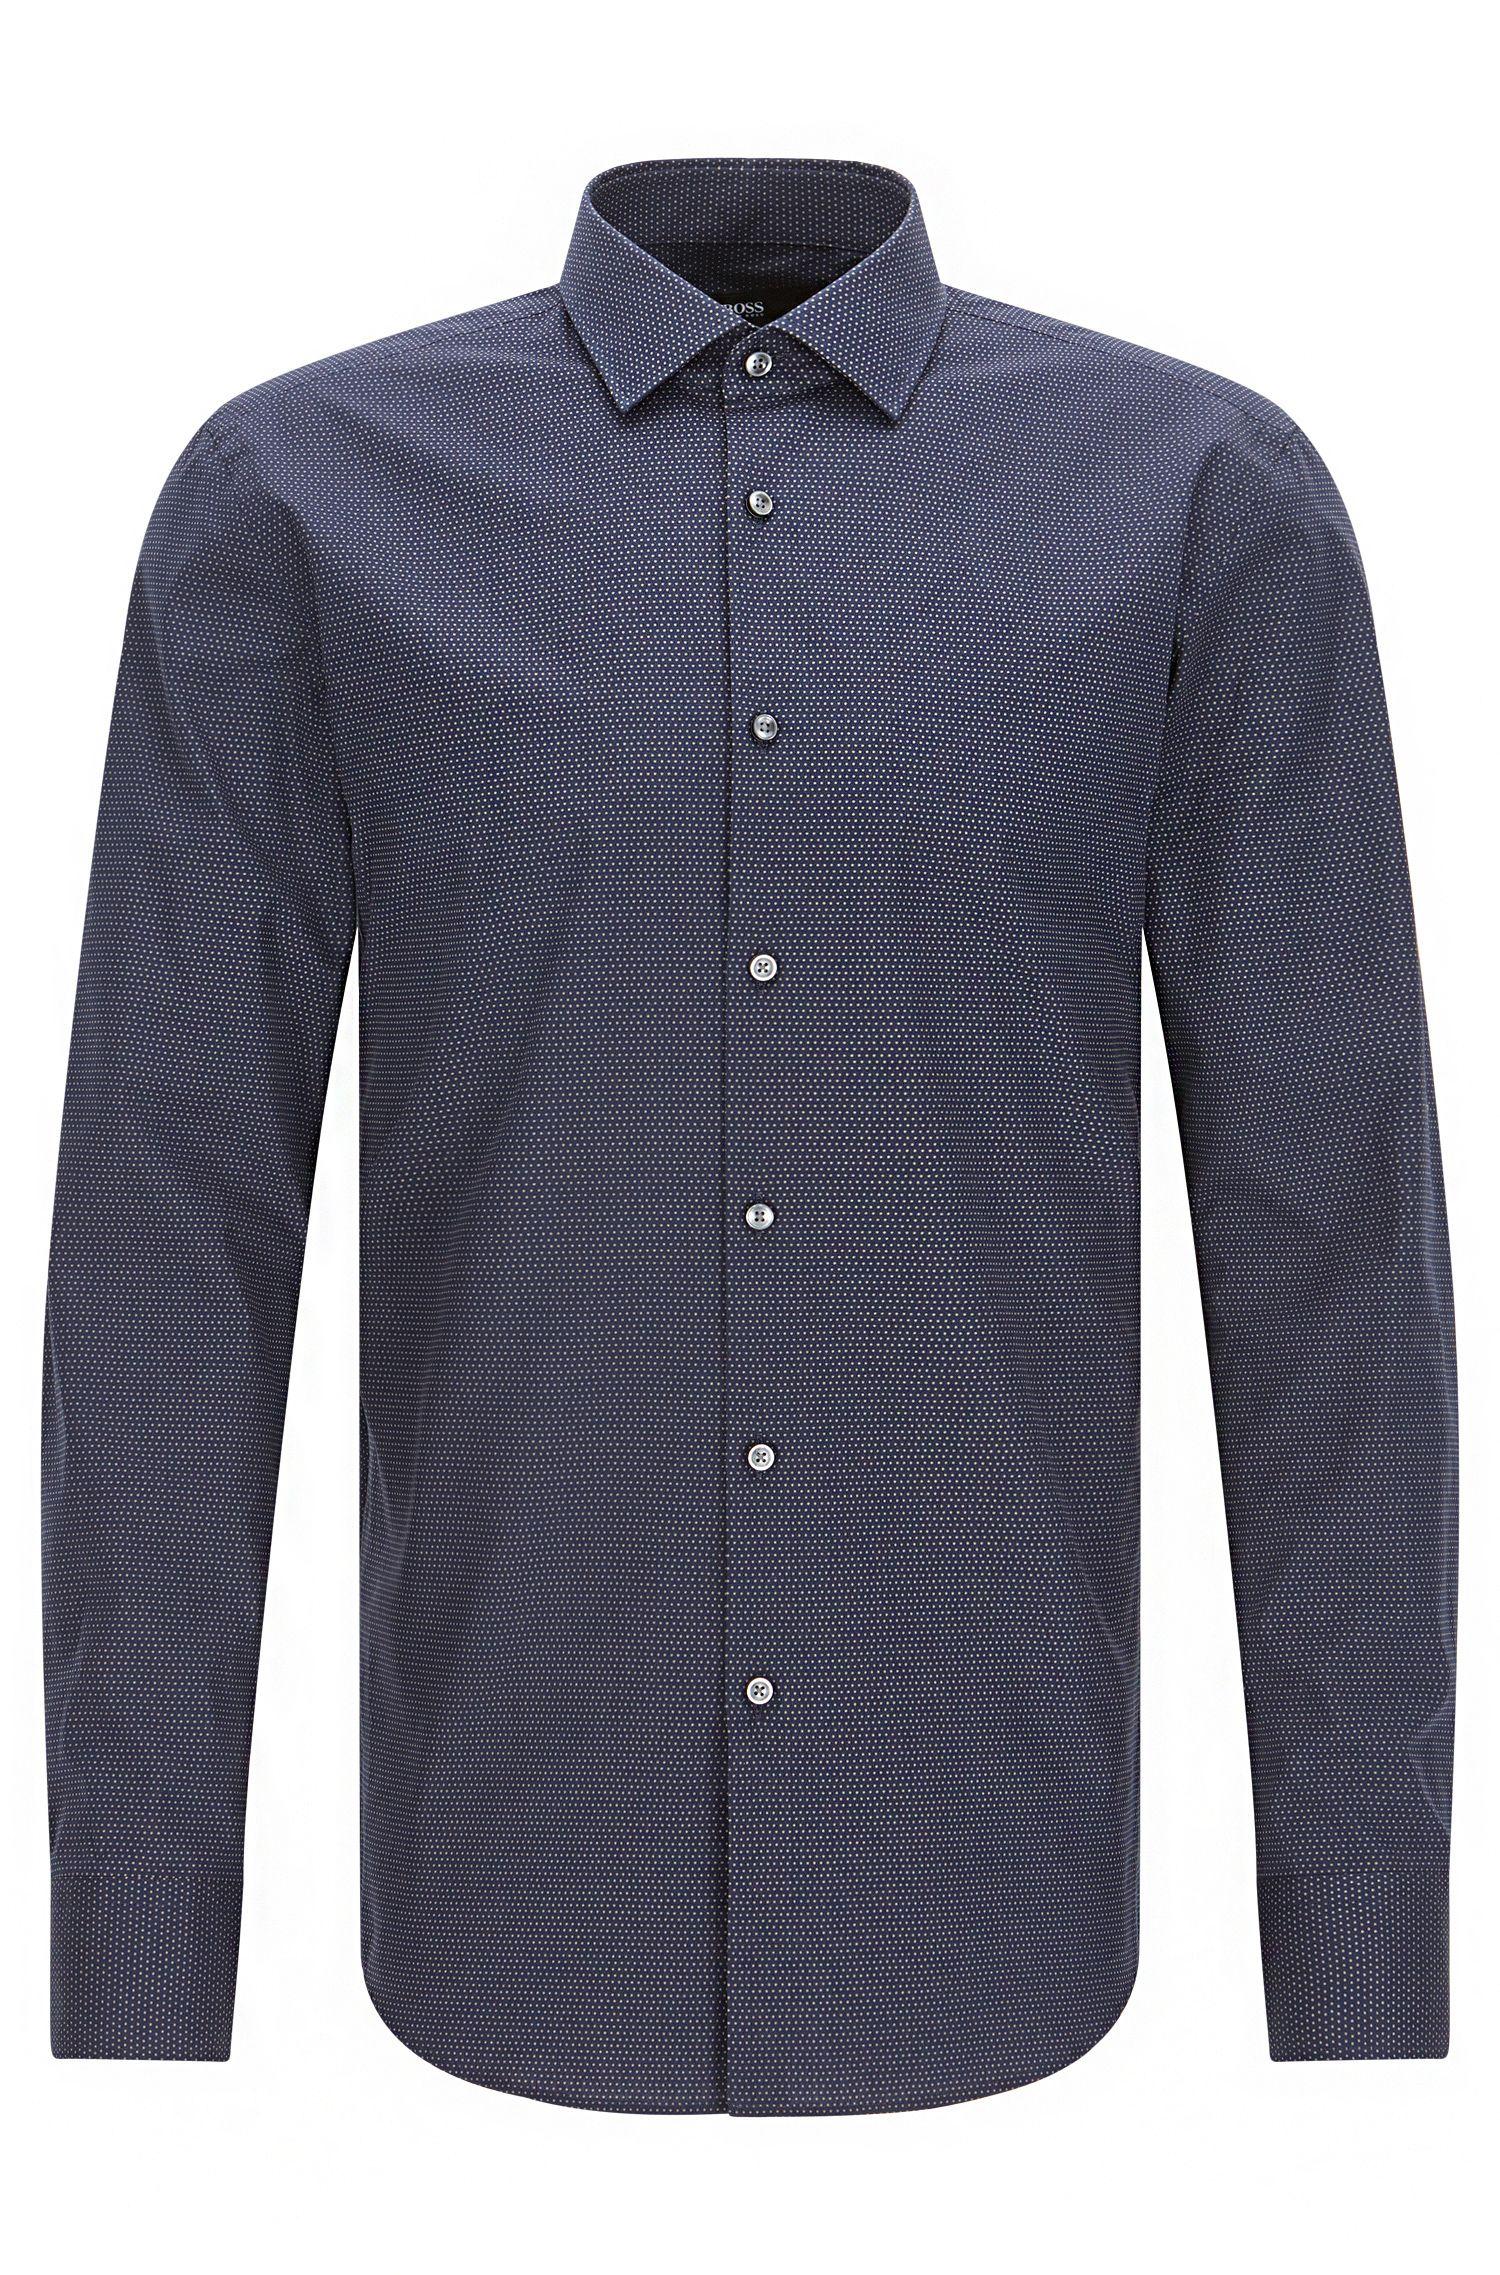 Slim-fit cotton poplin shirt with polka dot motif